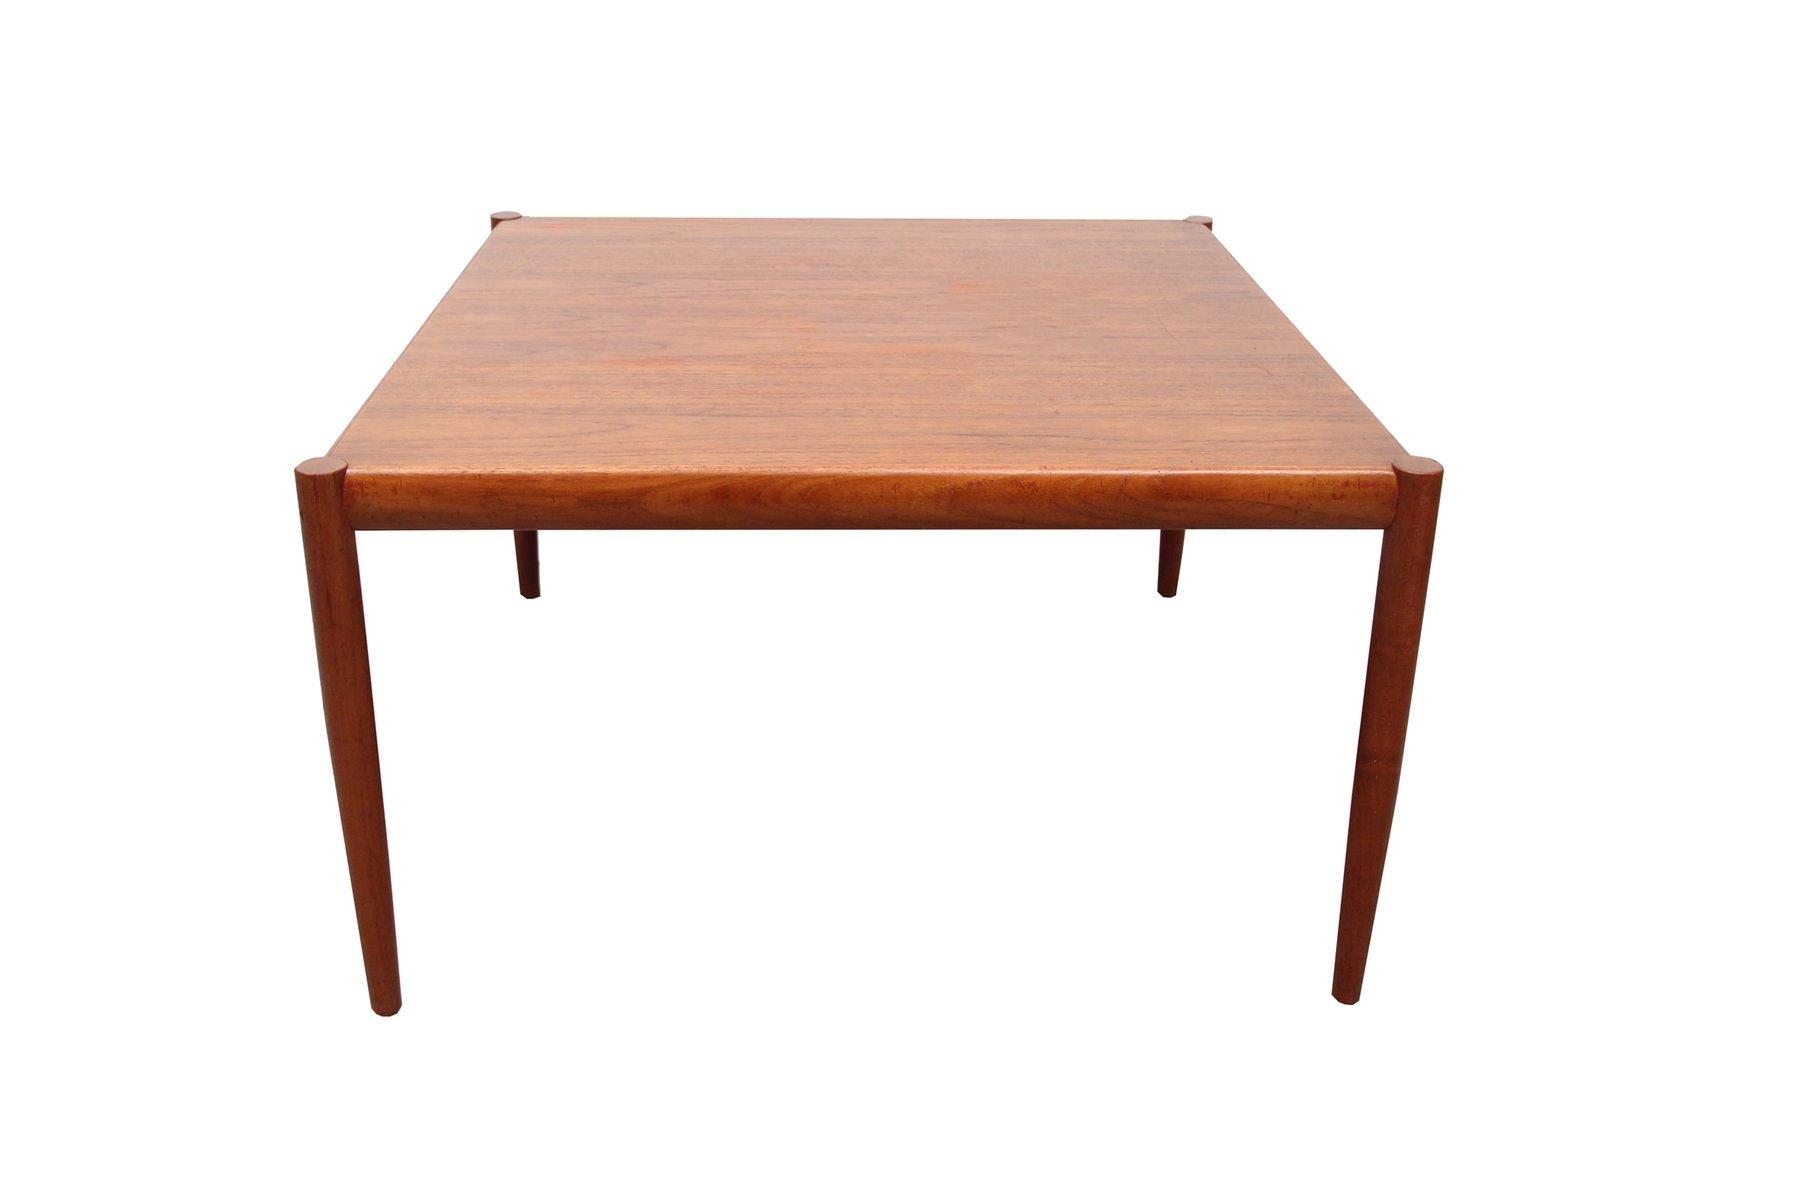 Square Danish Teak Veneer Coffee Table 1960s For Sale At Pamono